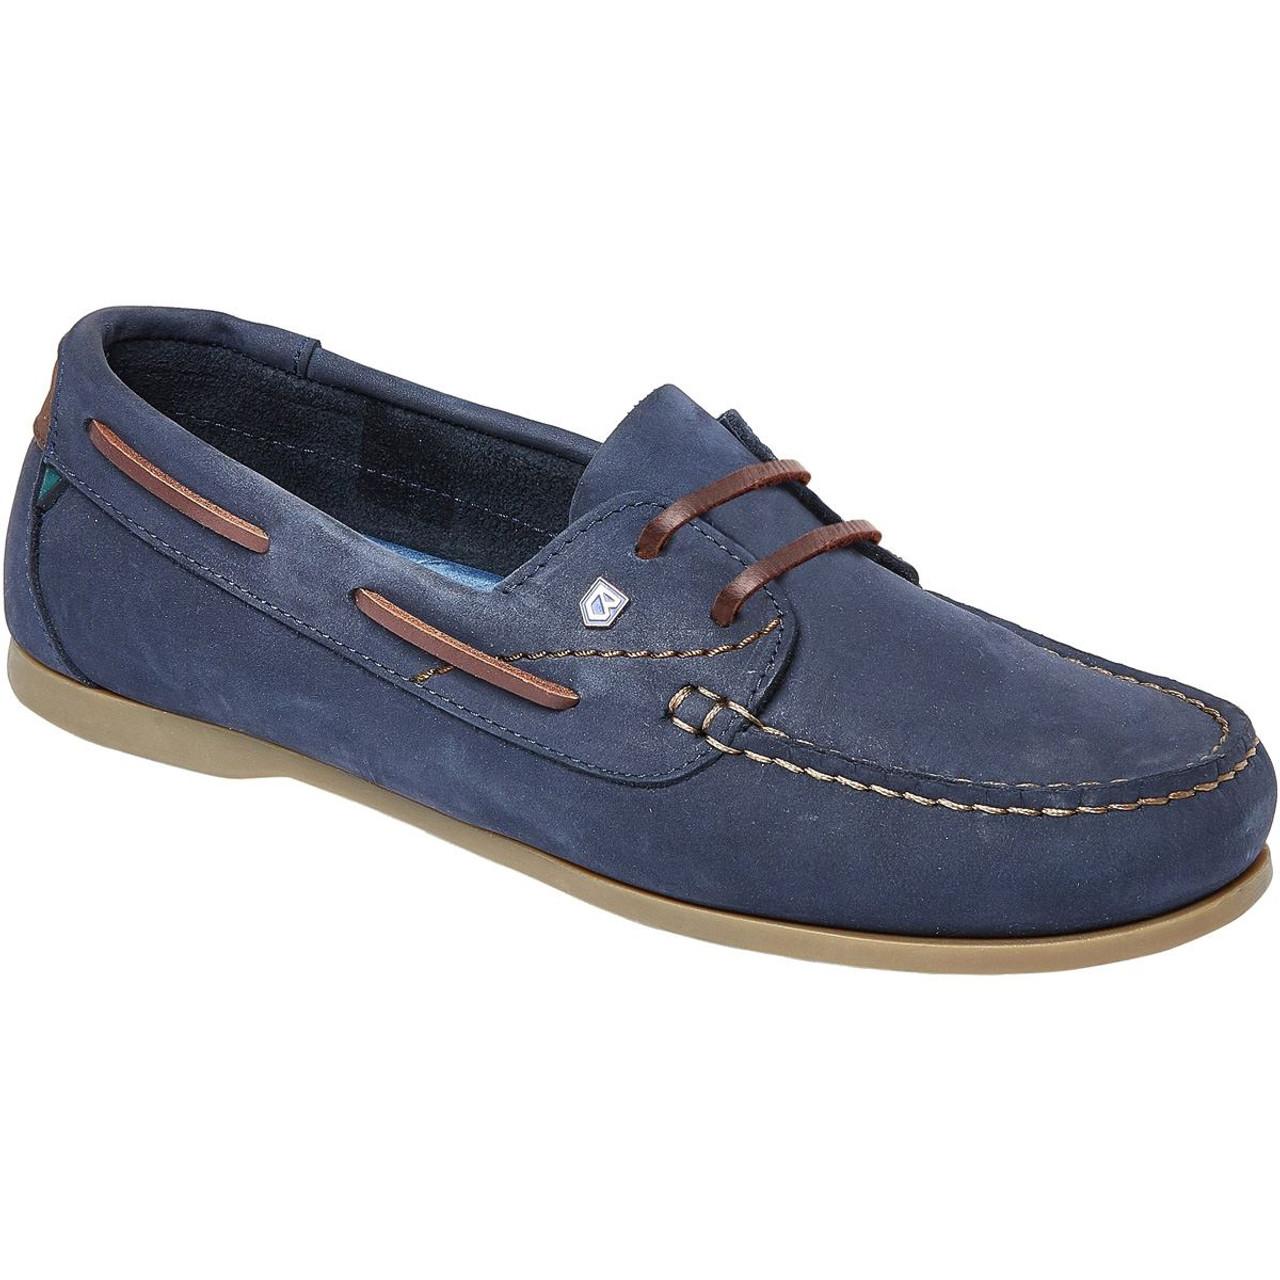 Dubarry Aruba Deck Shoes